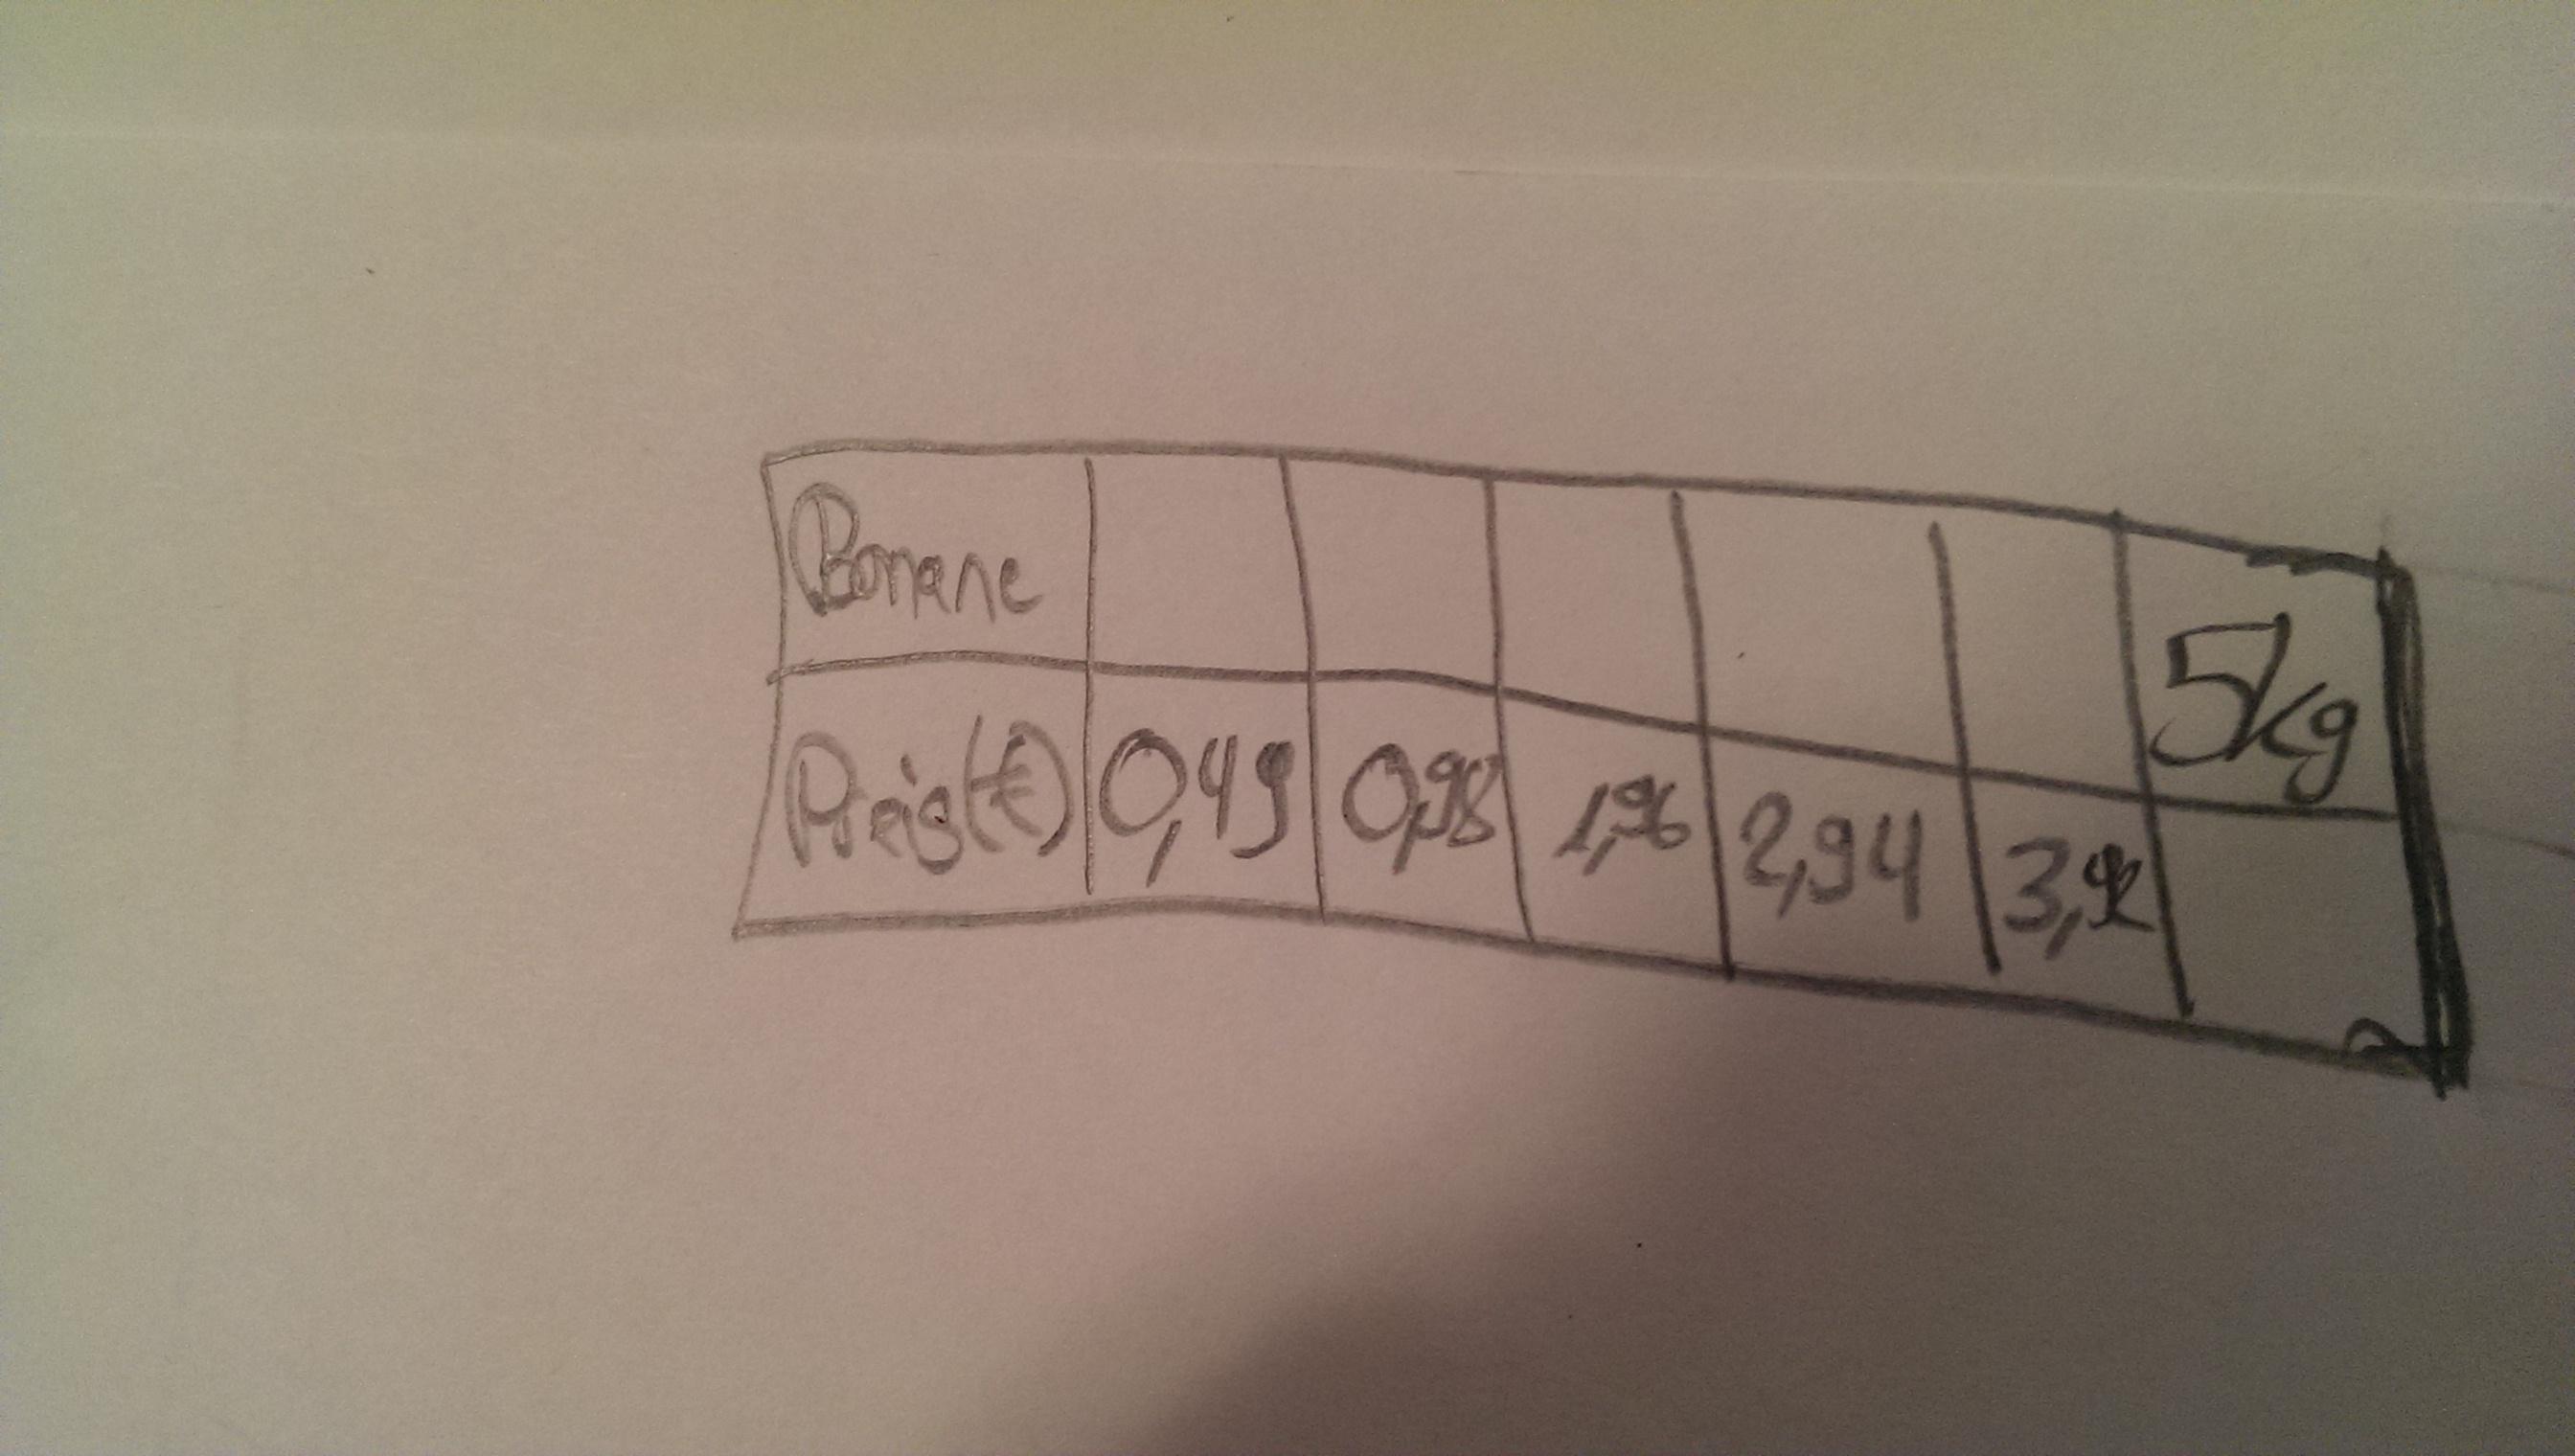 mathe hilfe bei tabellen rechnung funktion rechnen. Black Bedroom Furniture Sets. Home Design Ideas